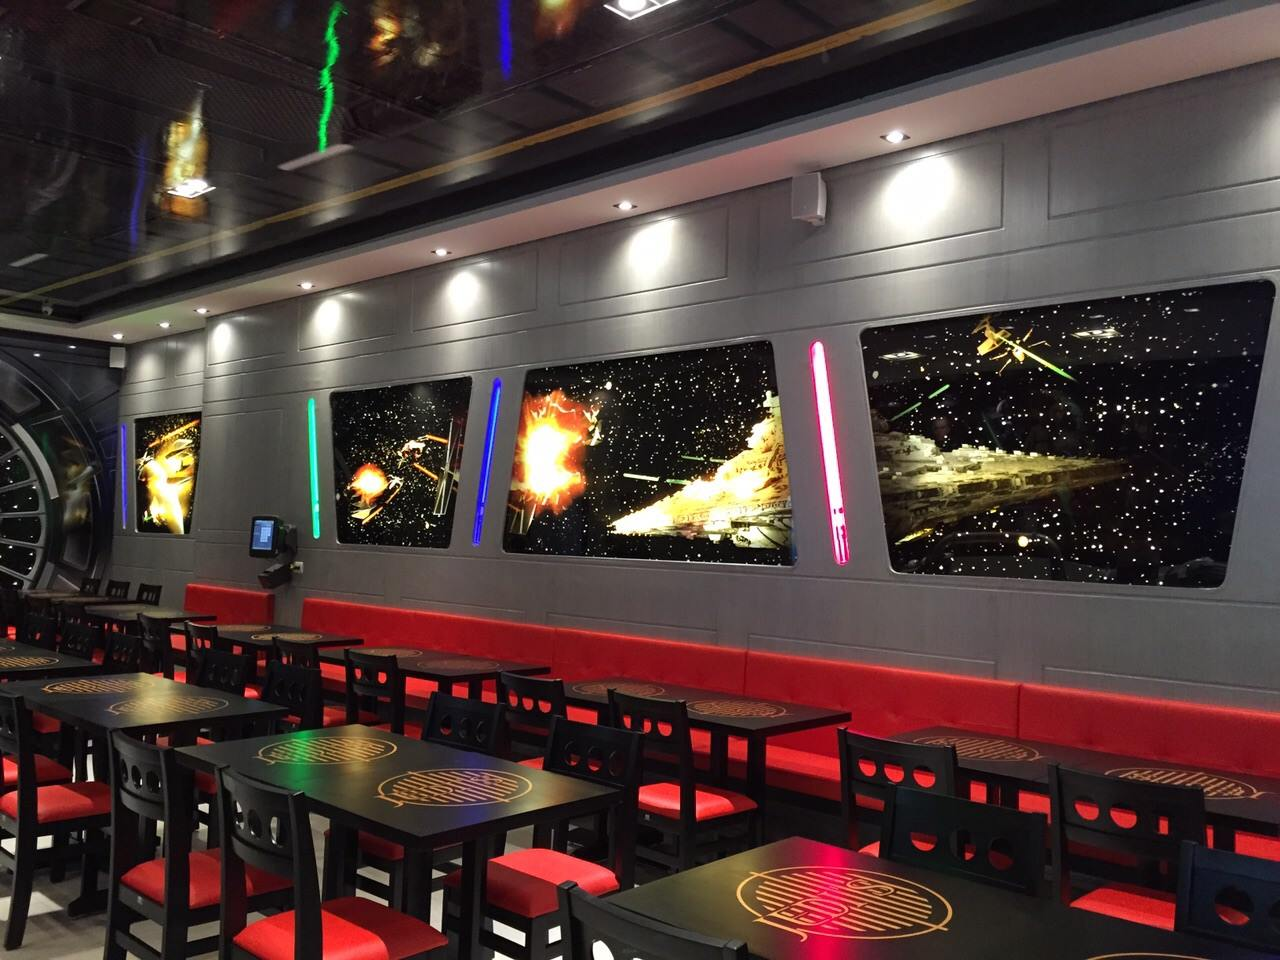 Jedi's Burger and Grill